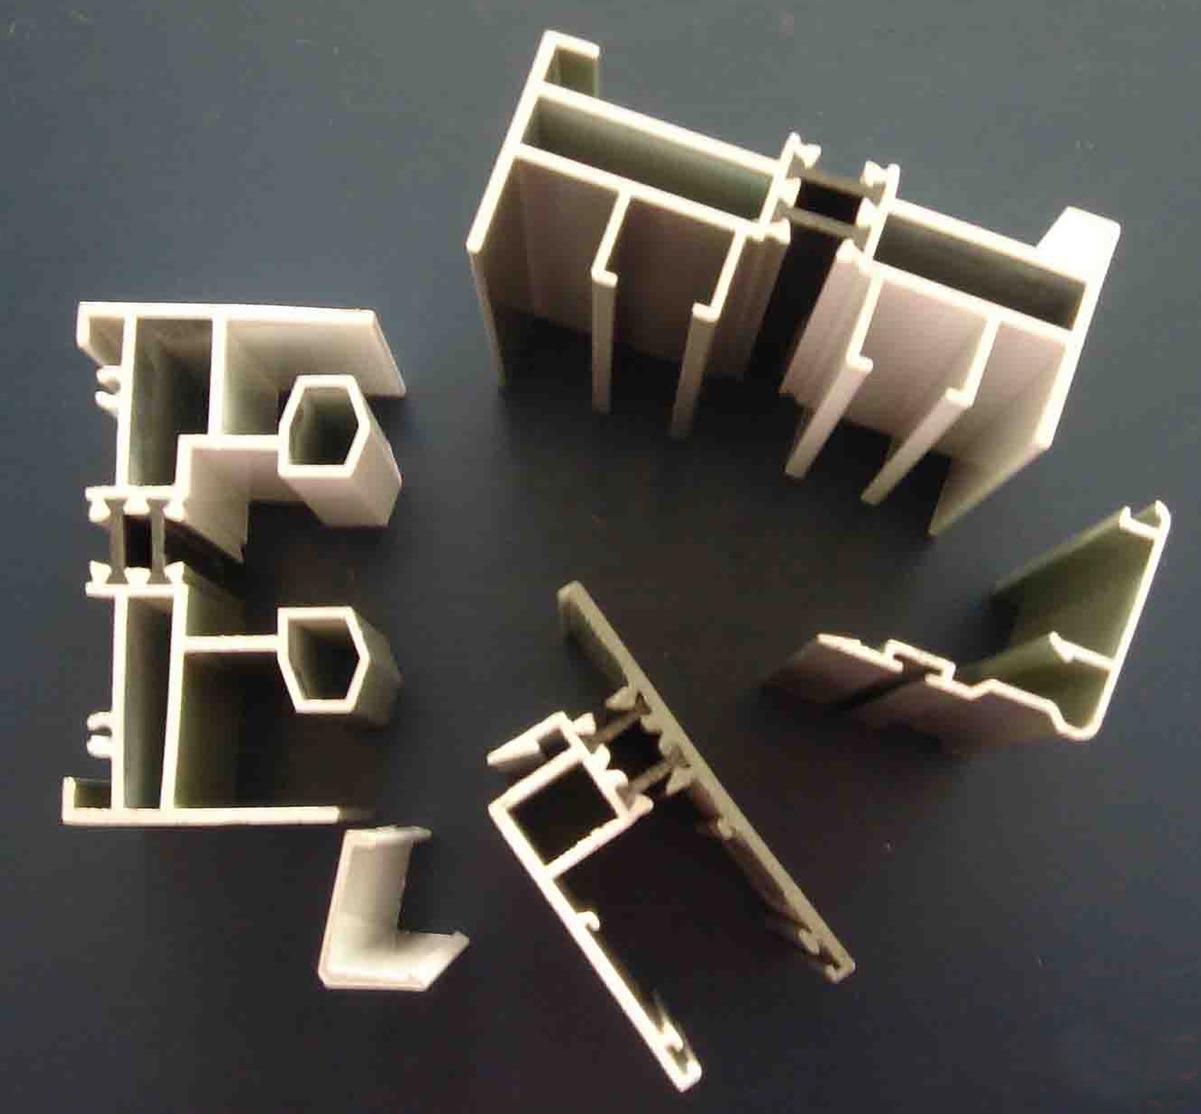 HLGR86 Aluminum Profile (HLGR86 Aluminum Profile)